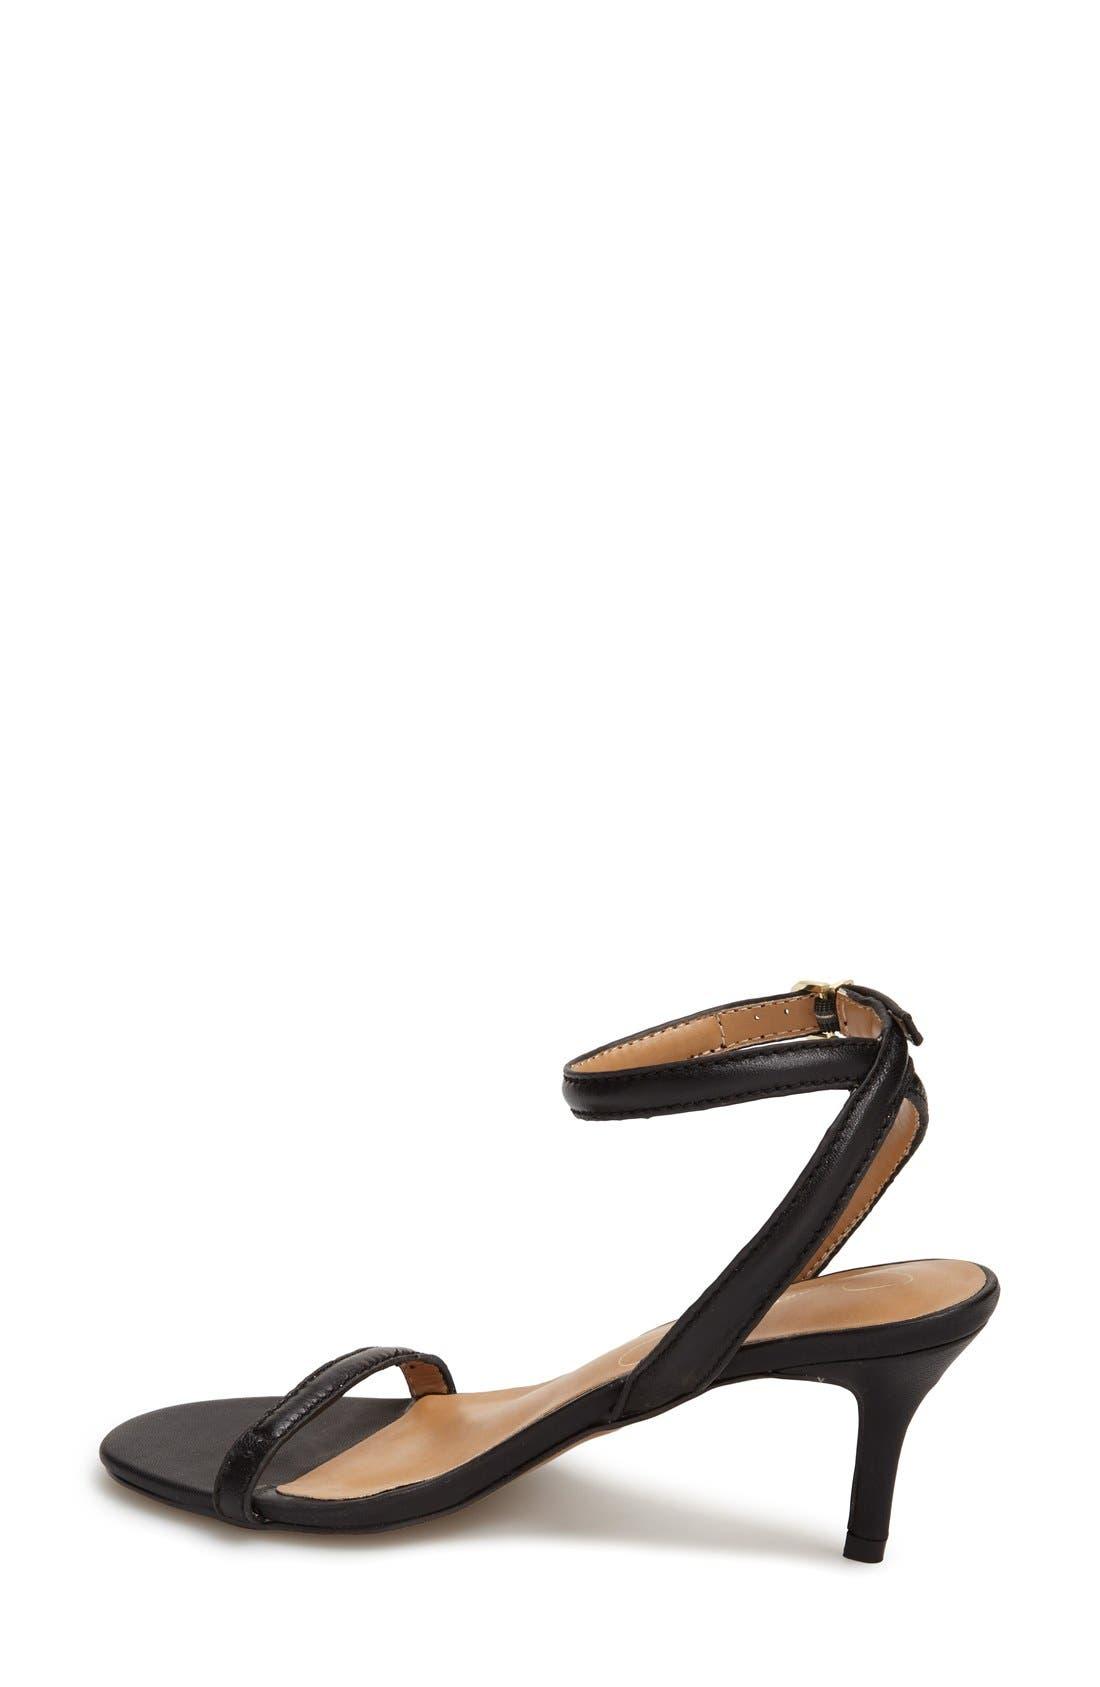 REPORT 'Signature Neely' Ankle Strap Sandal,                             Alternate thumbnail 4, color,                             001